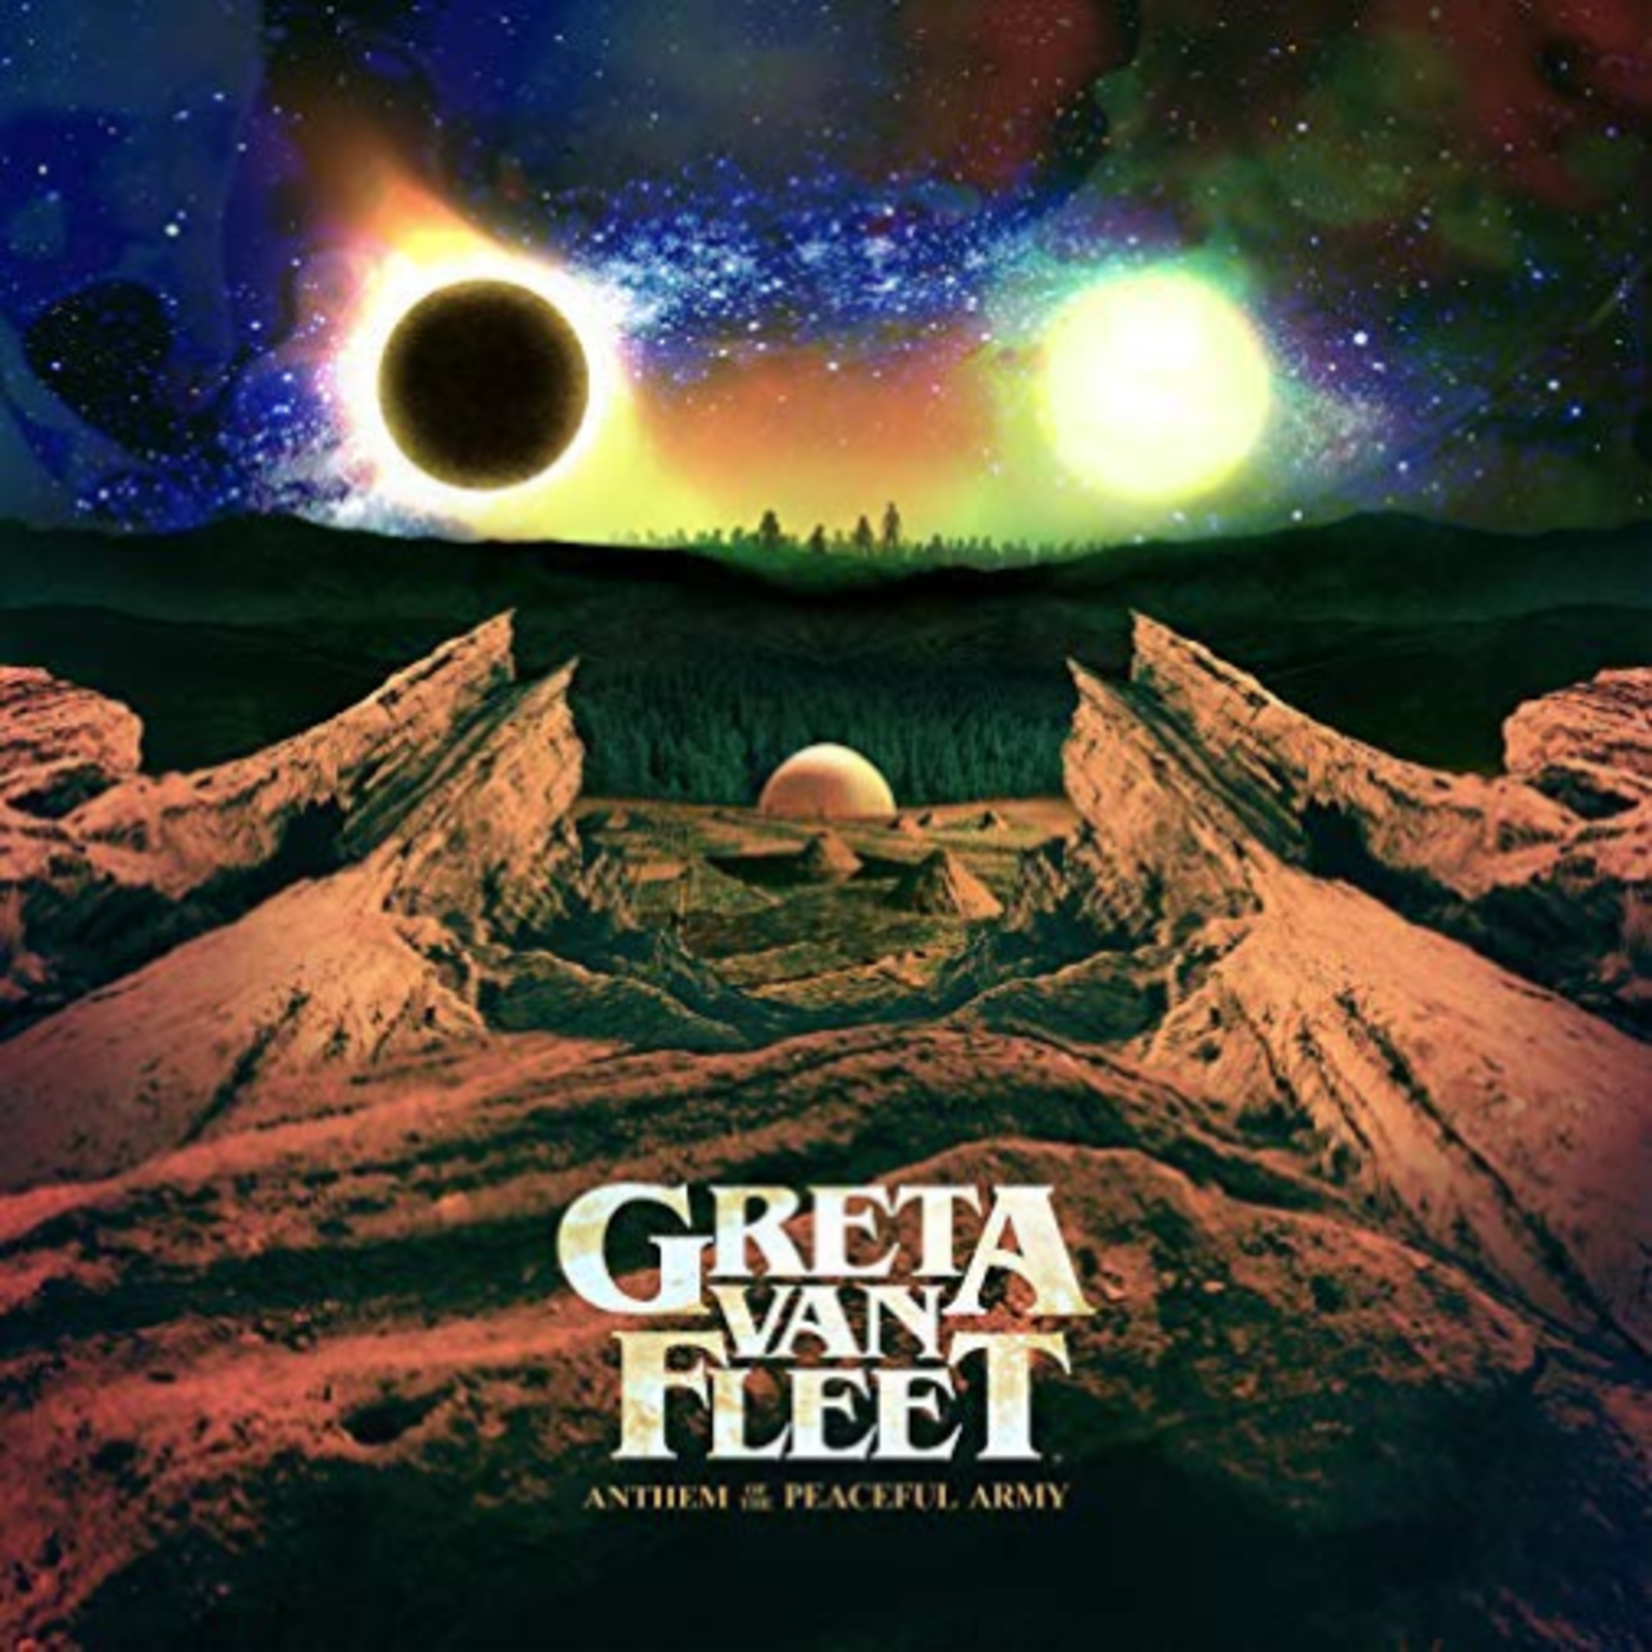 GRETA VAN FLEET ANTHEM OF THE PEACEFUL ARMY (LP)